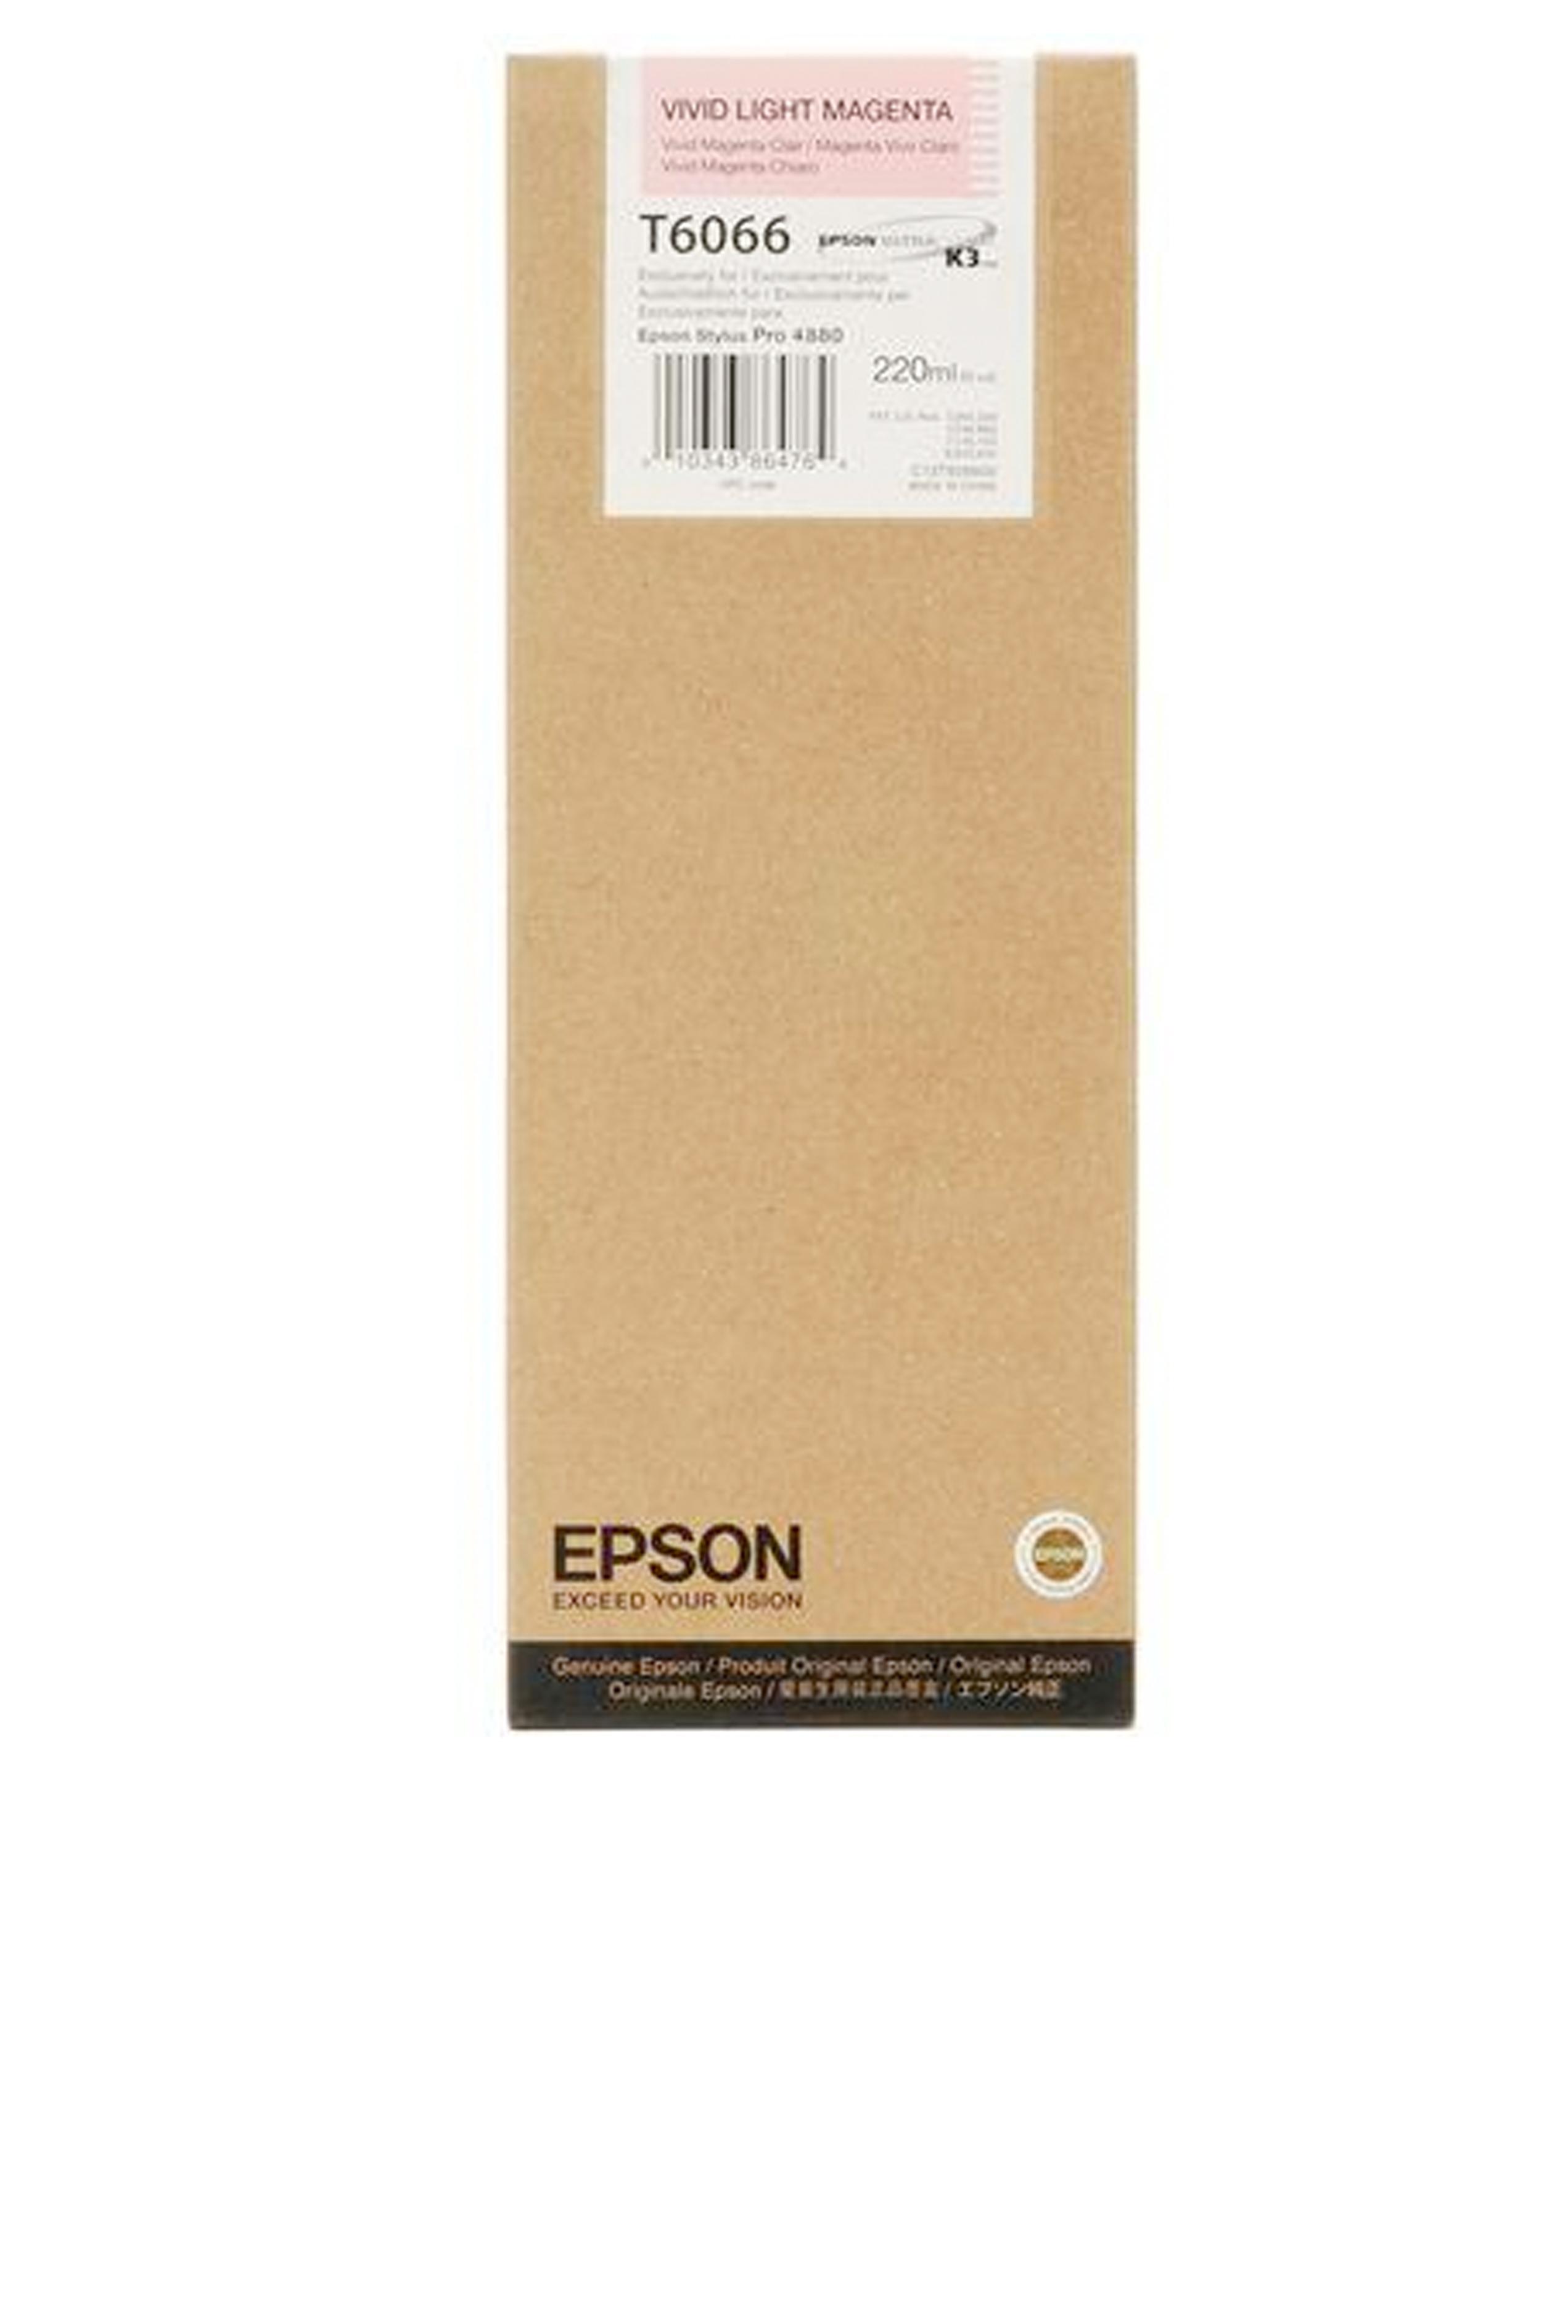 Epson EPSON HI VIVID LT MAGENTA (220 ML) (T606600)